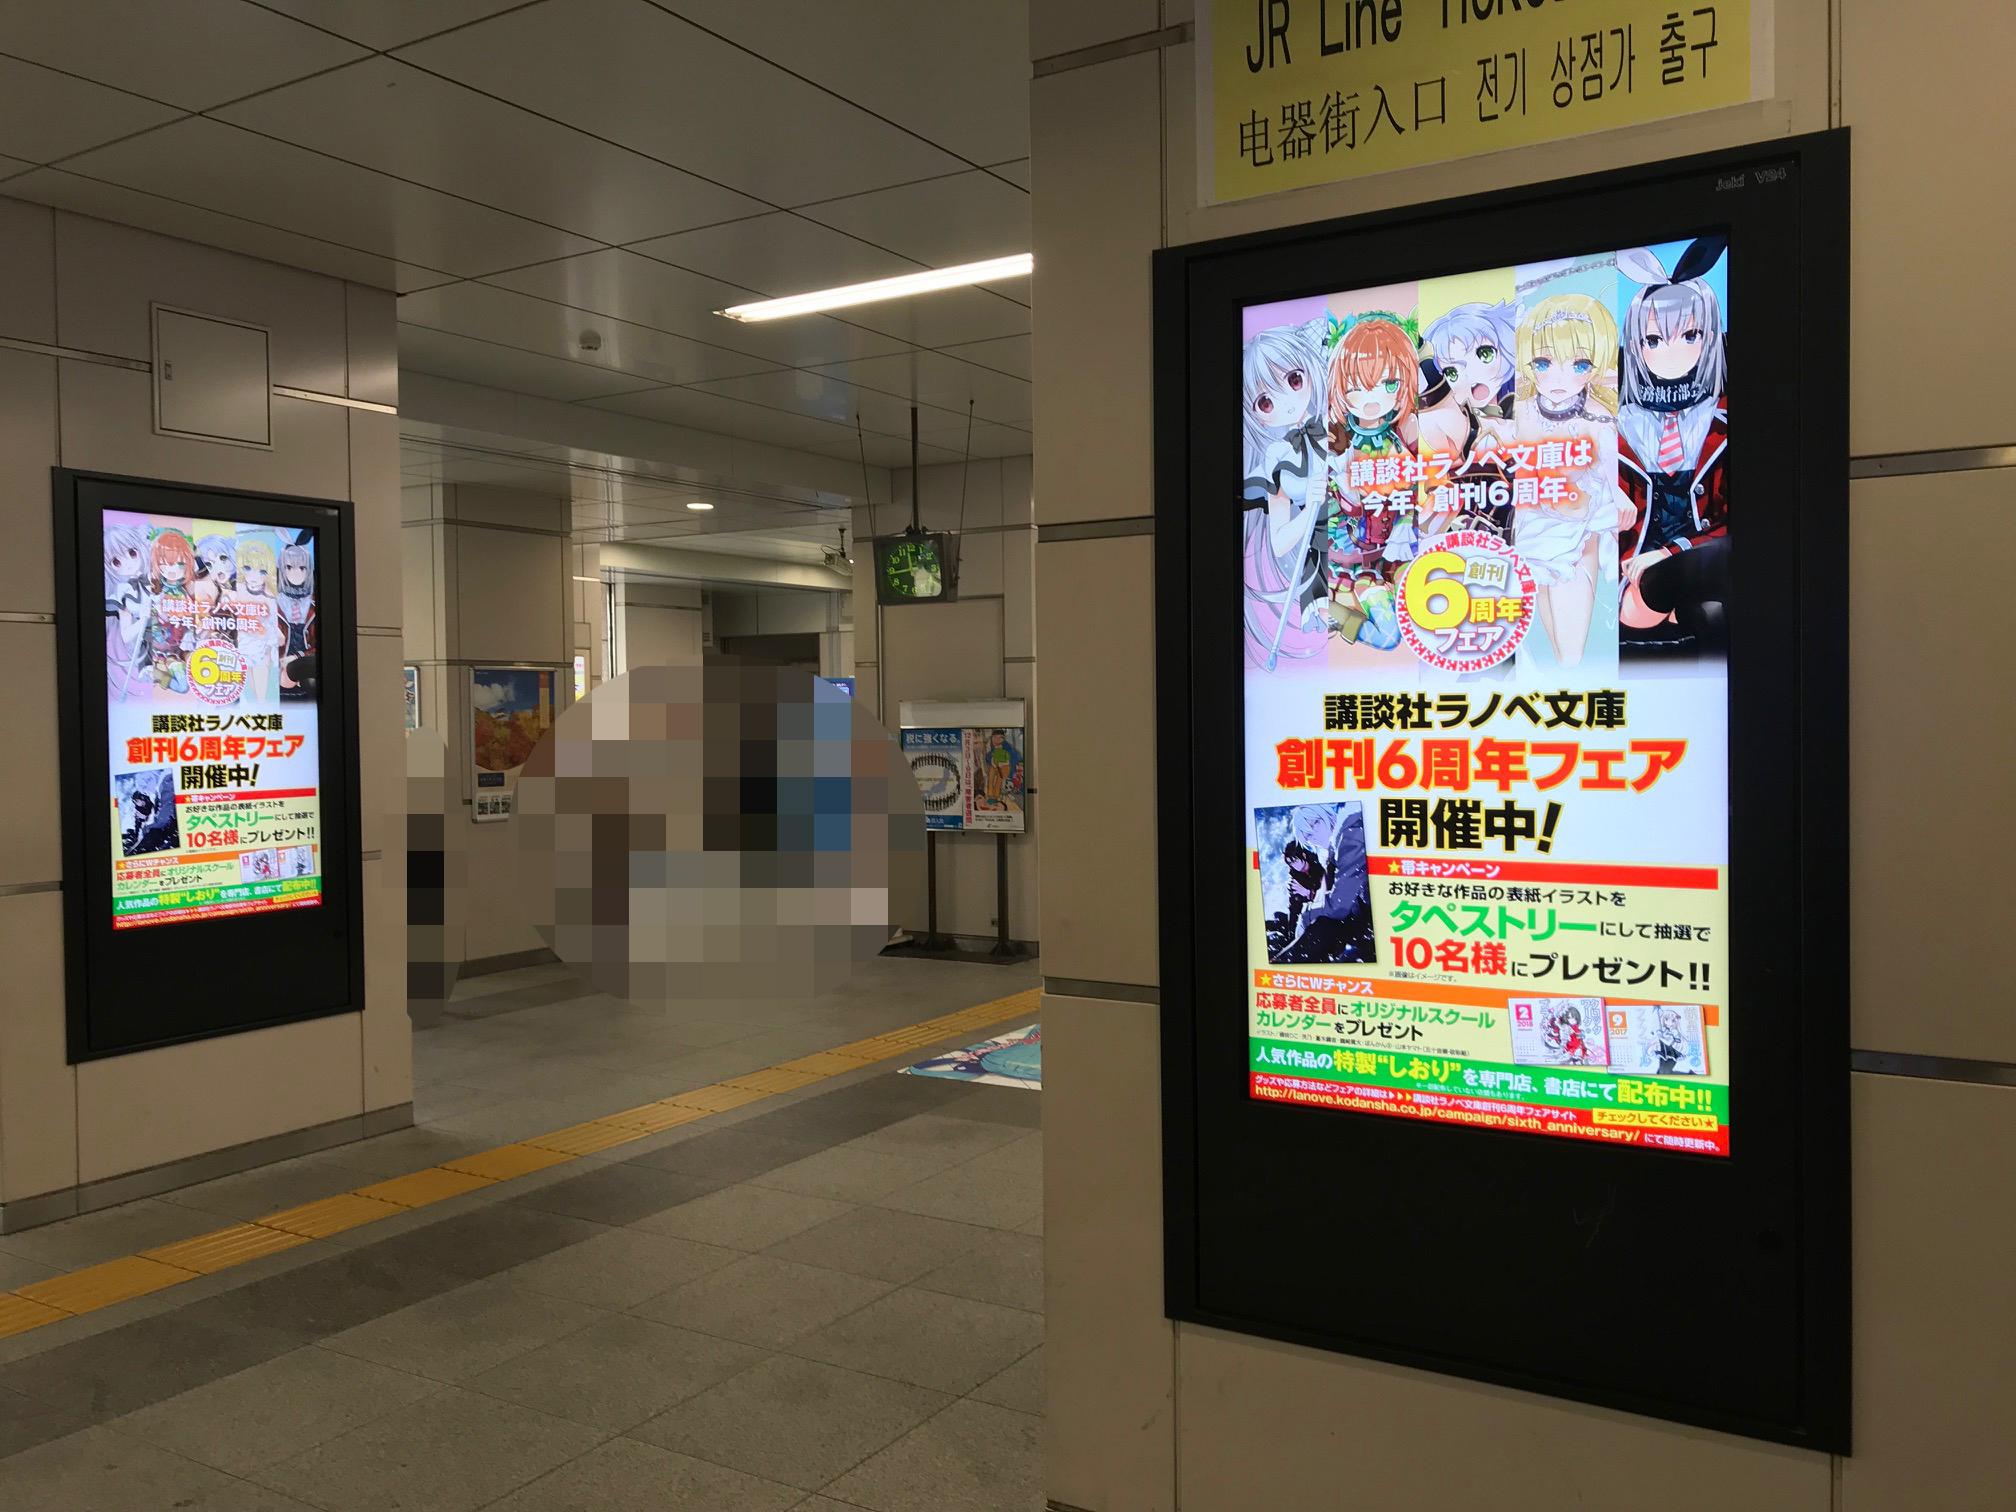 JR秋葉原駅!講談社ラノベ文庫創刊6周年フェアのサイネージ★